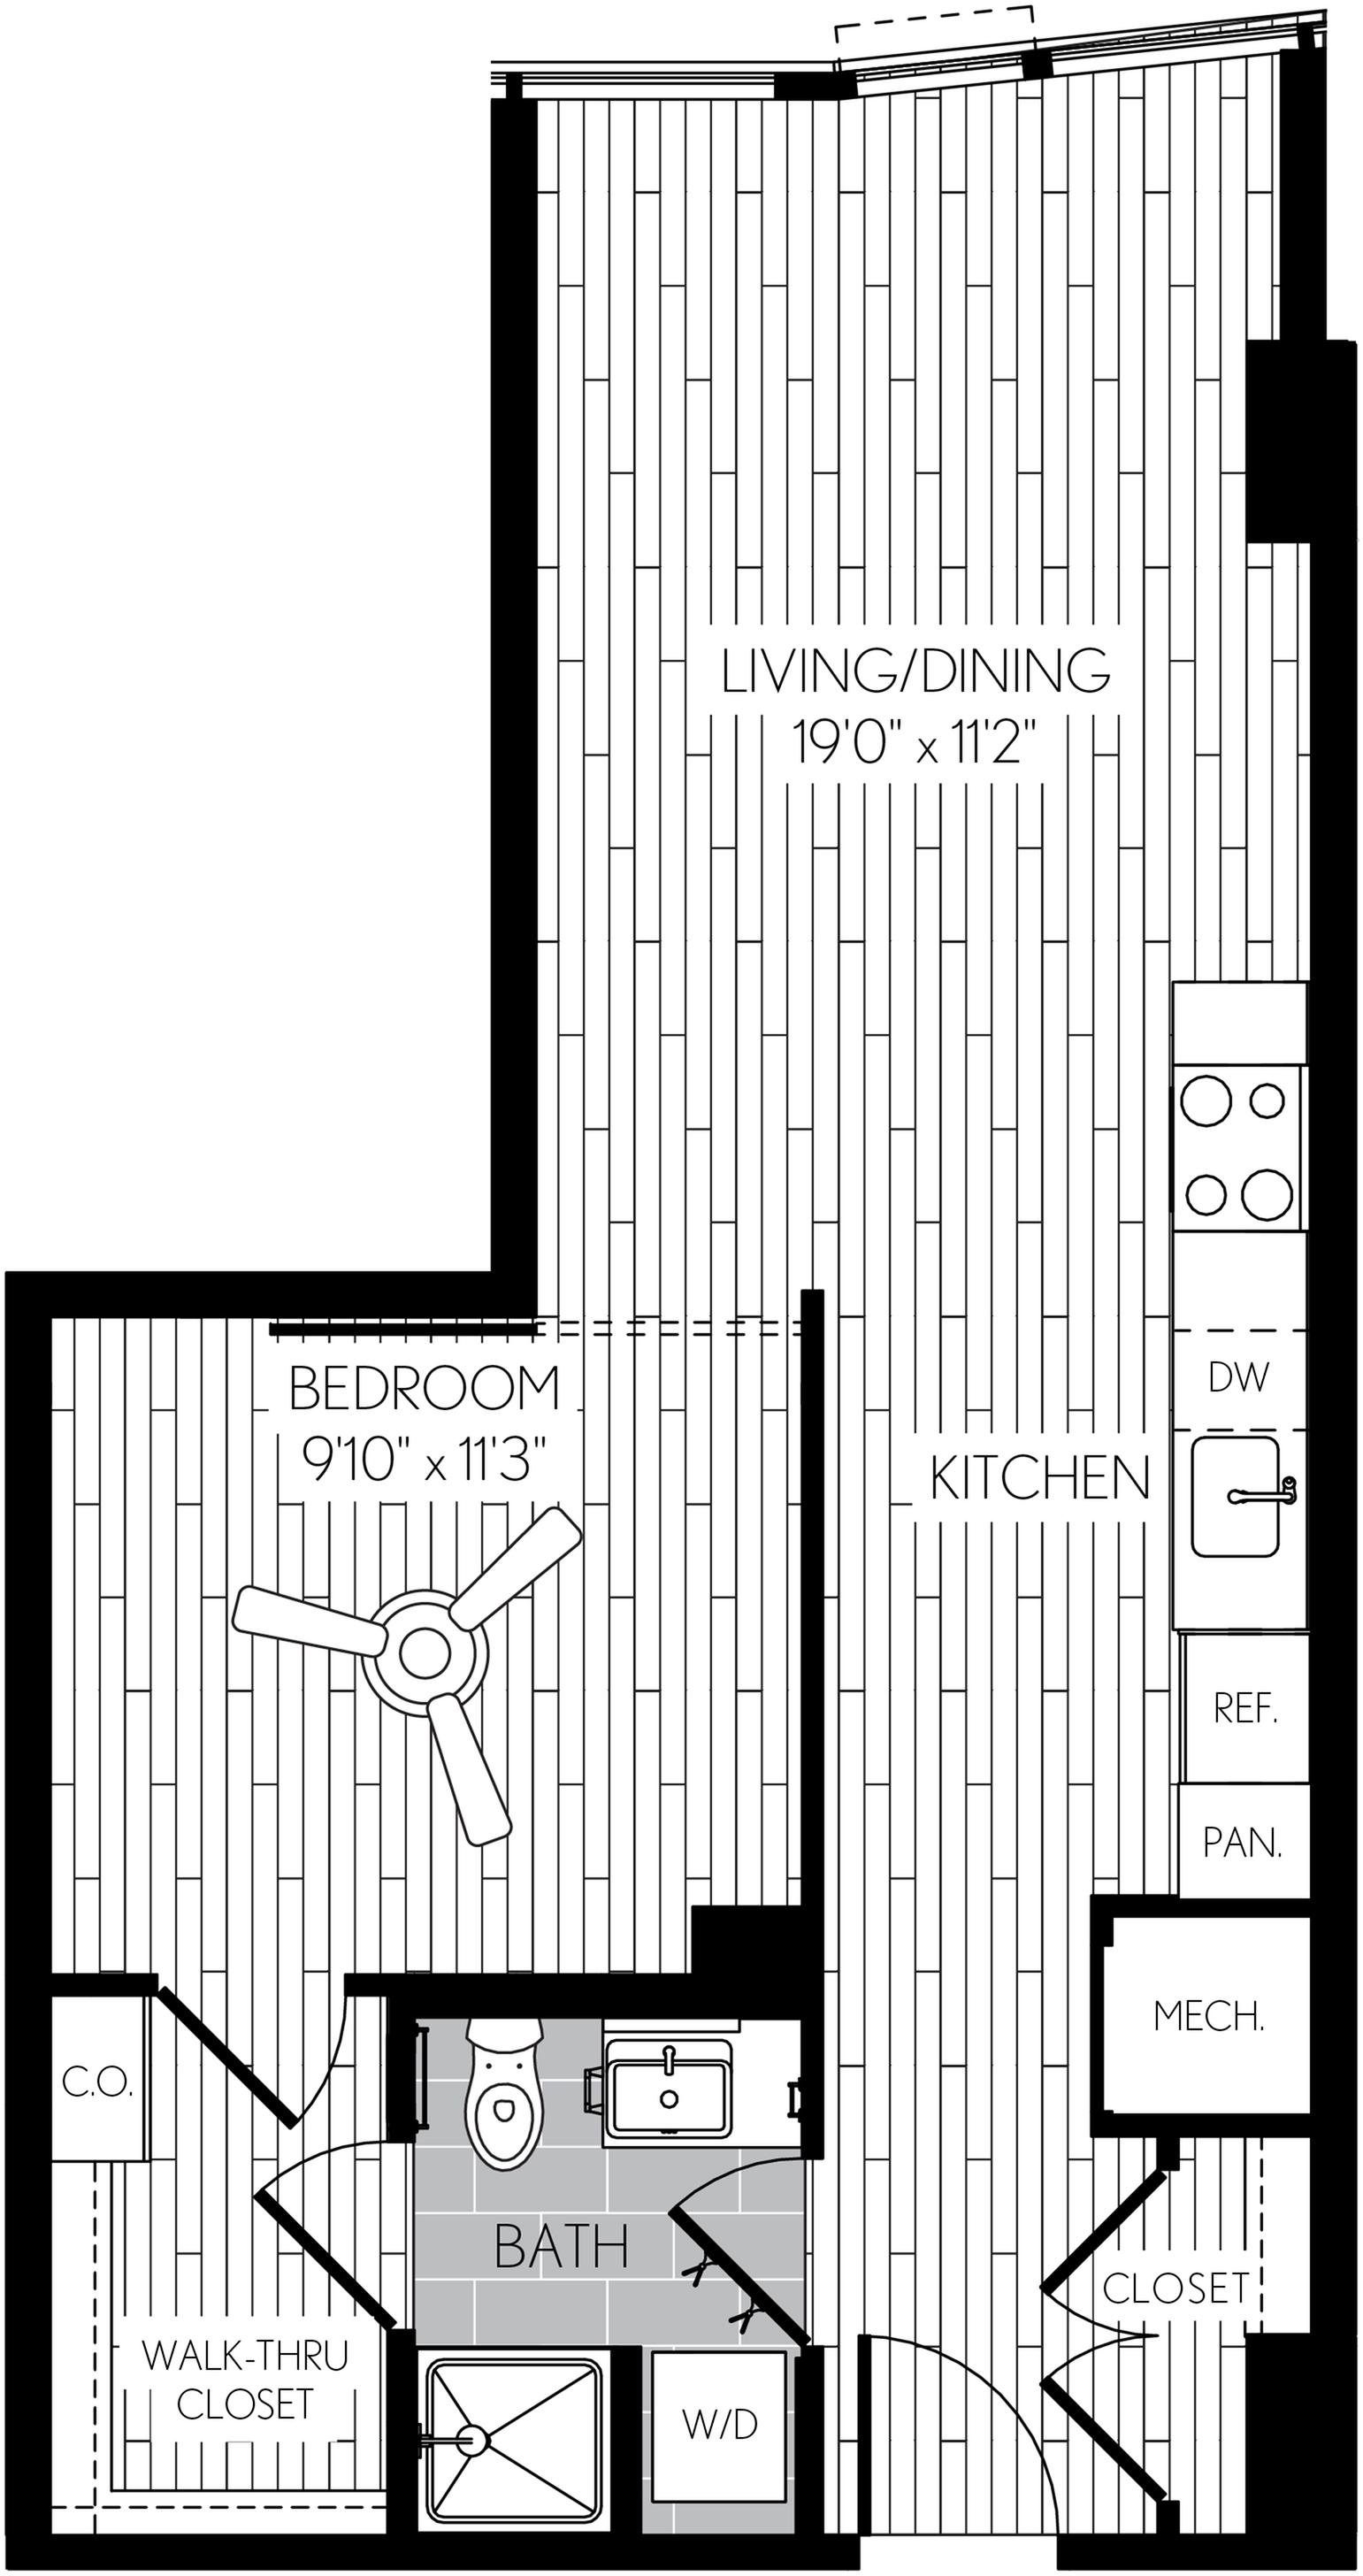 596 square foot one bedroom one bath apartment floorplan image